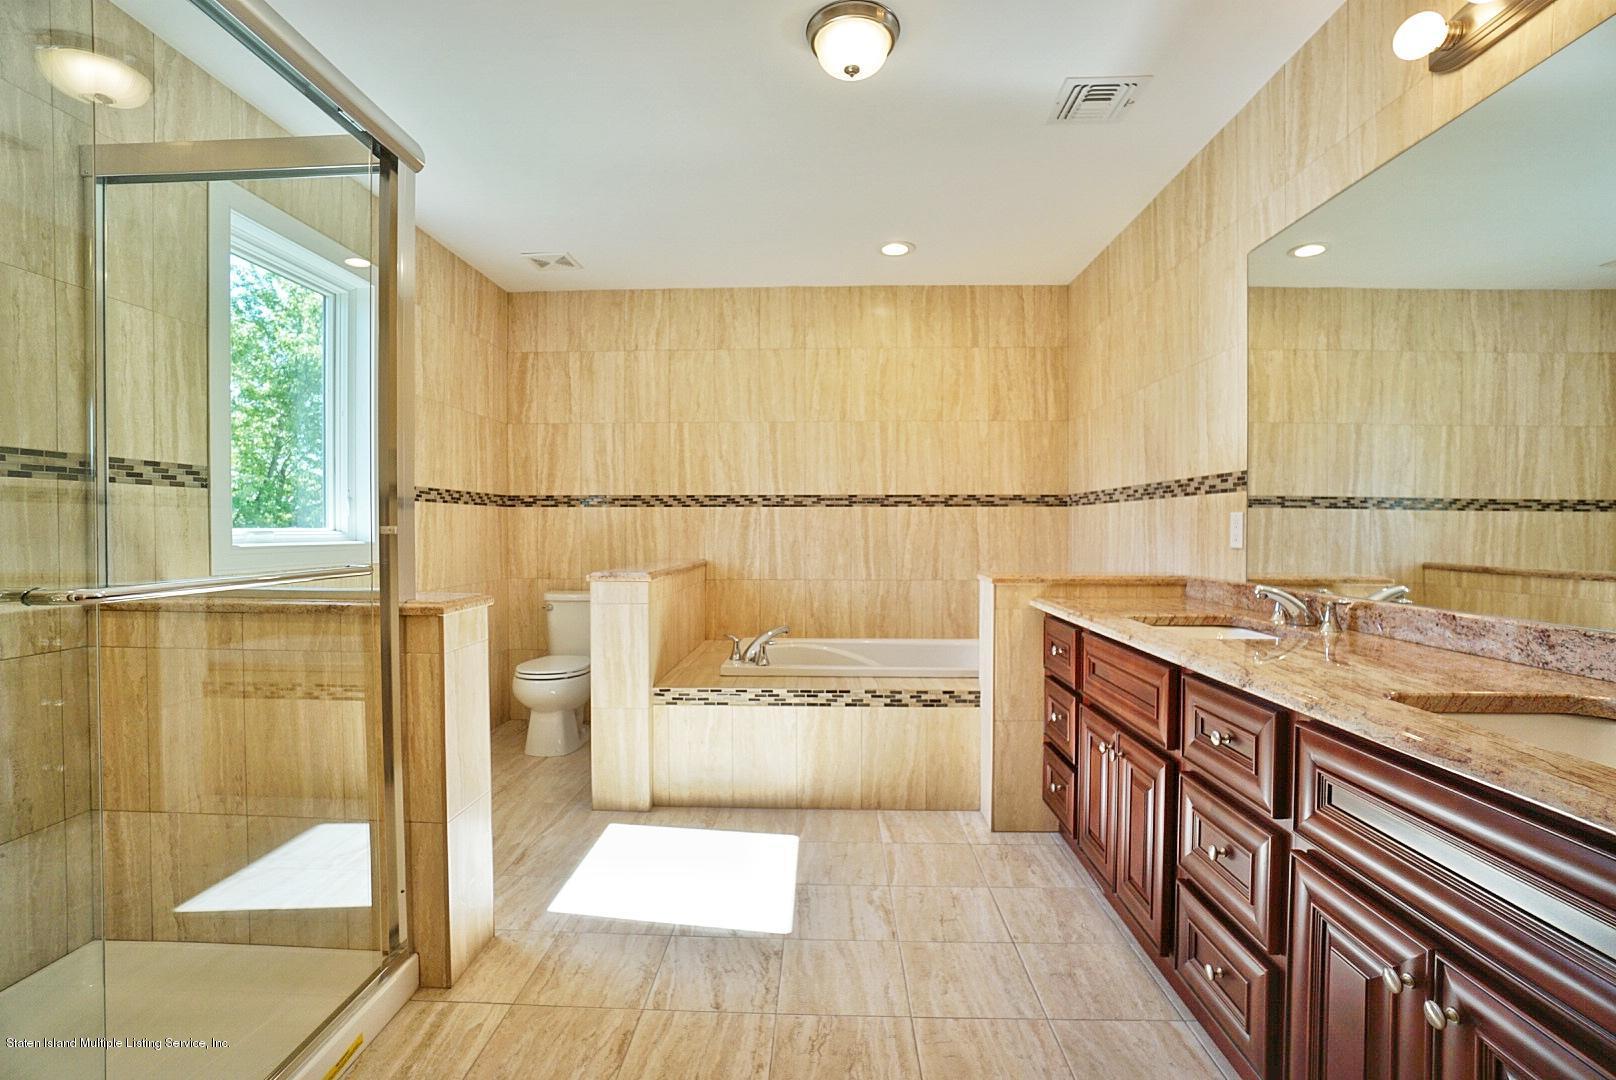 Single Family - Detached 678 Yetman Avenue  Staten Island, NY 10307, MLS-1132766-54